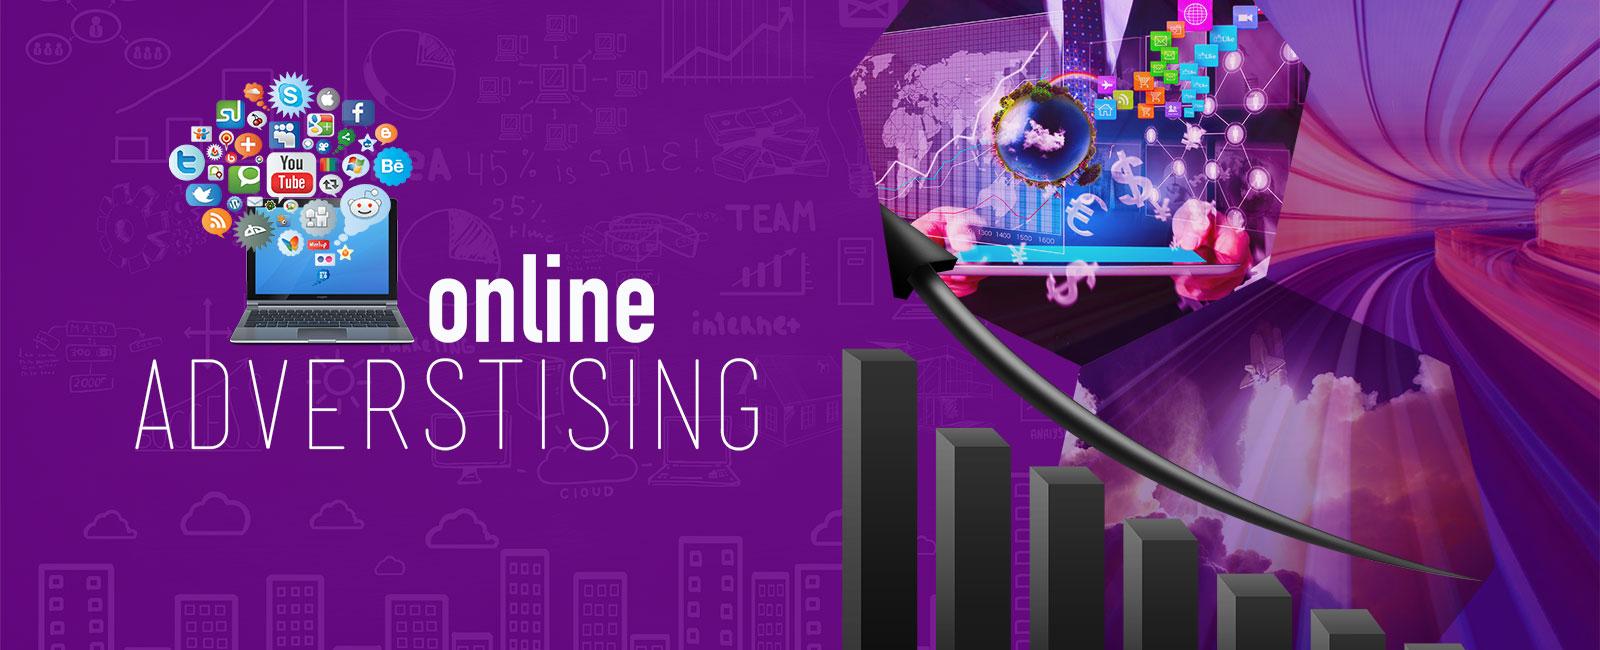 01-online-advertising